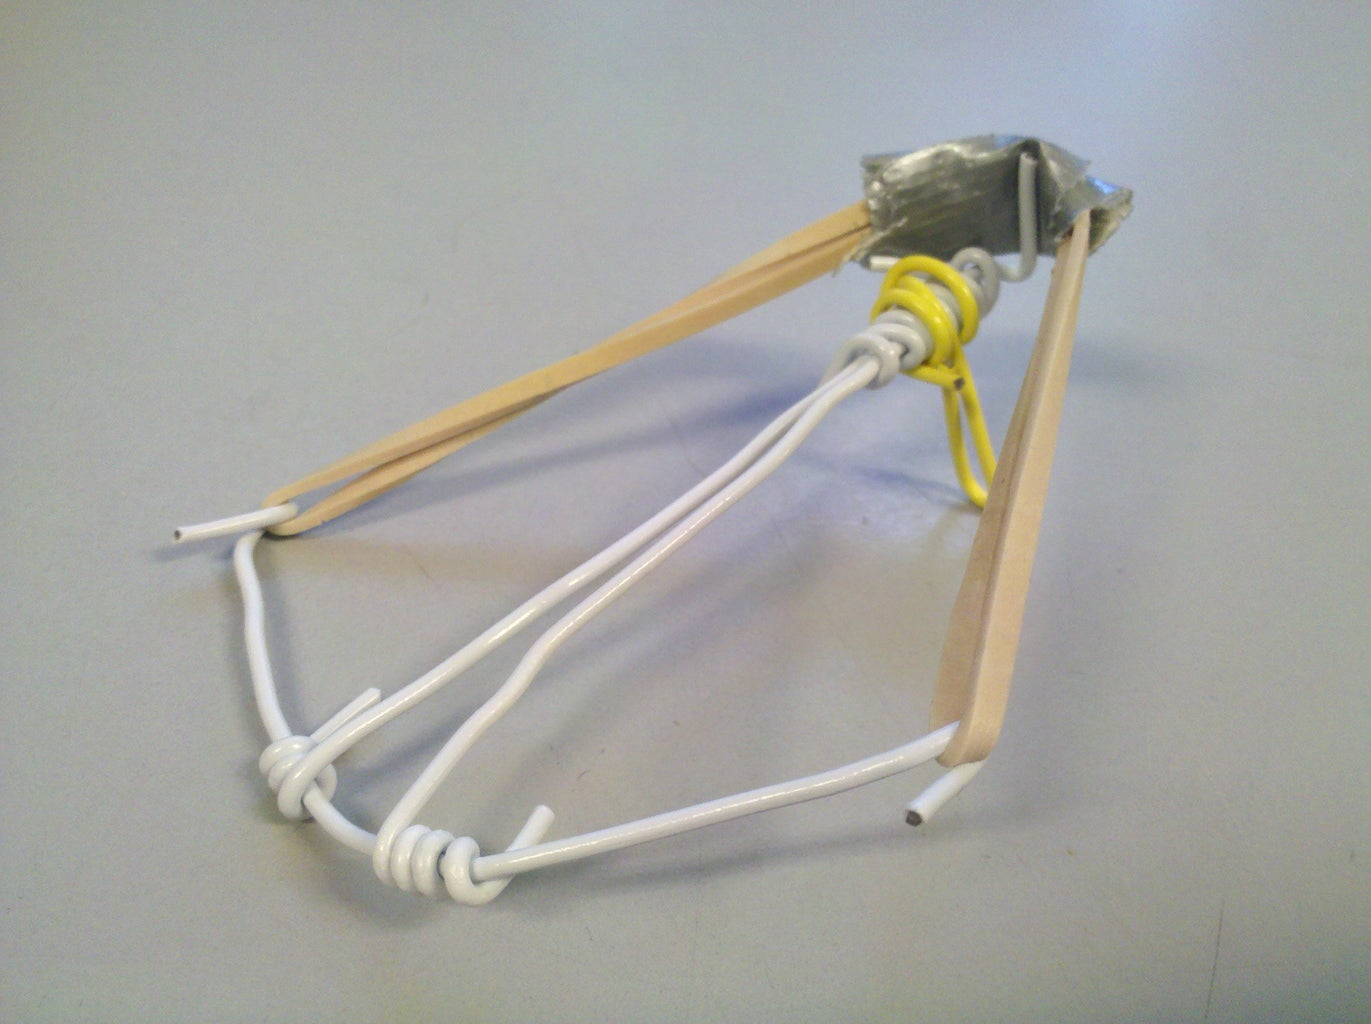 Reception Desk Paperclip Crossbow